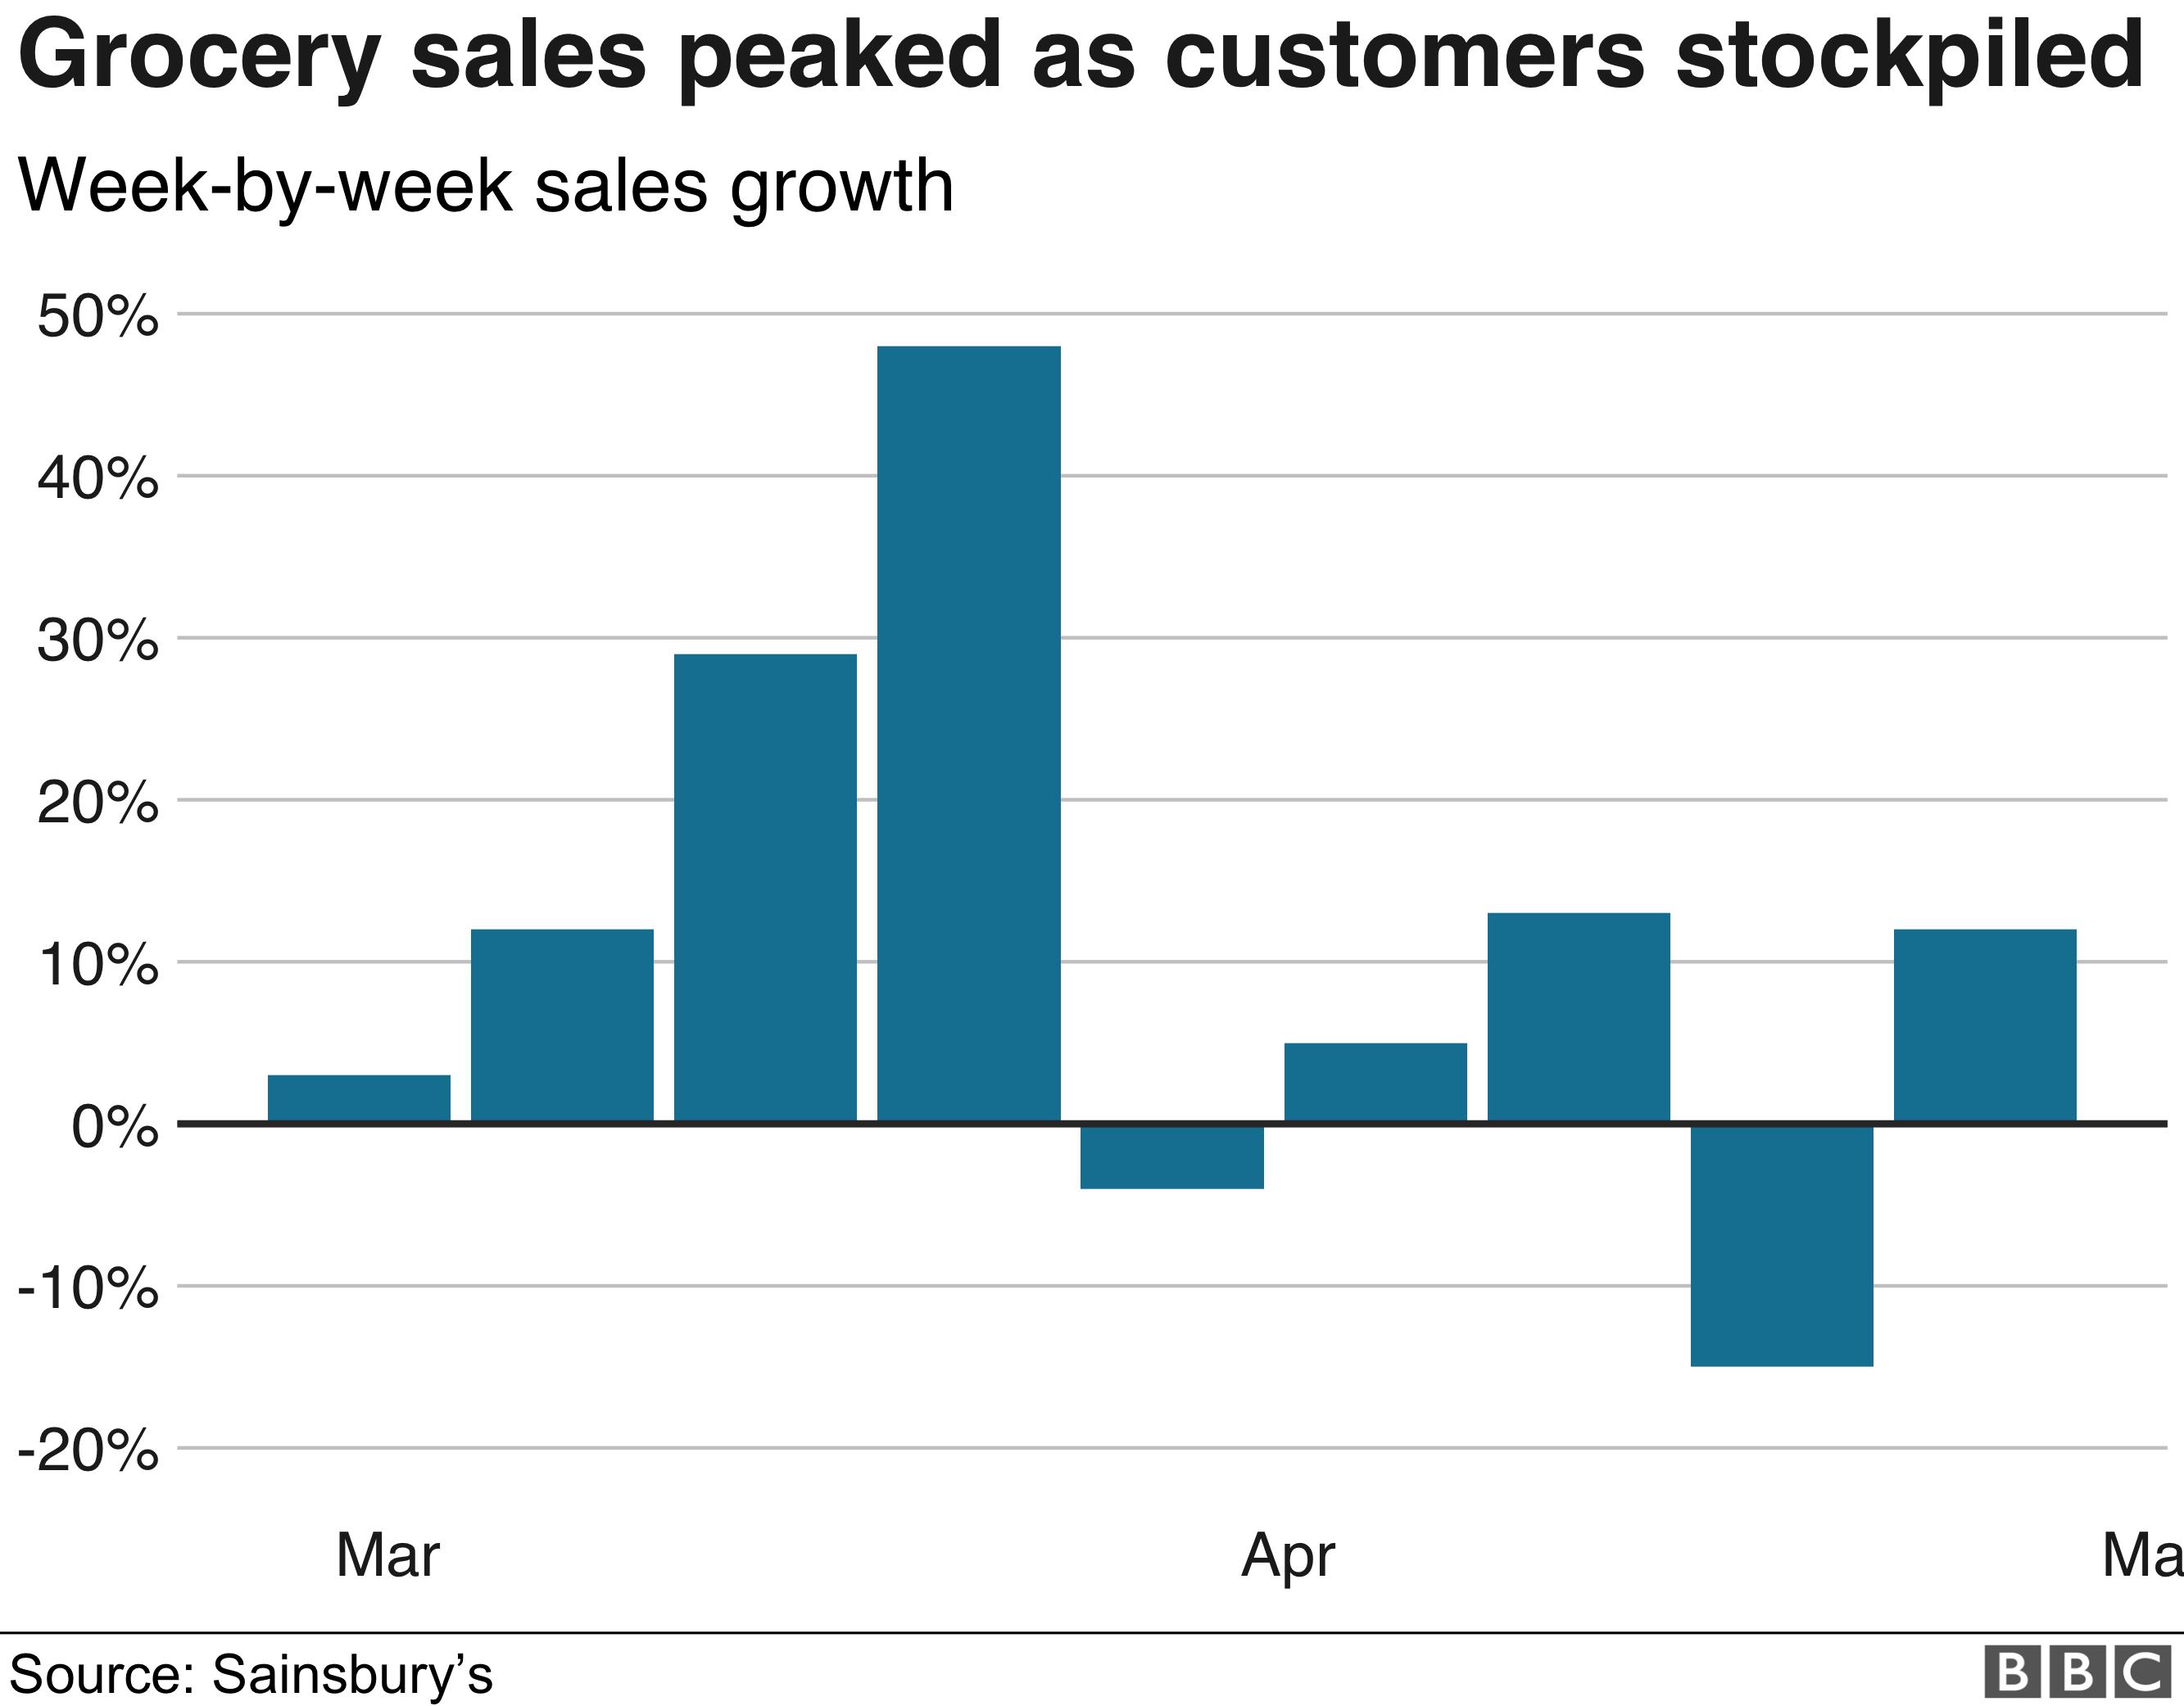 Sainsbury's sales growth chart